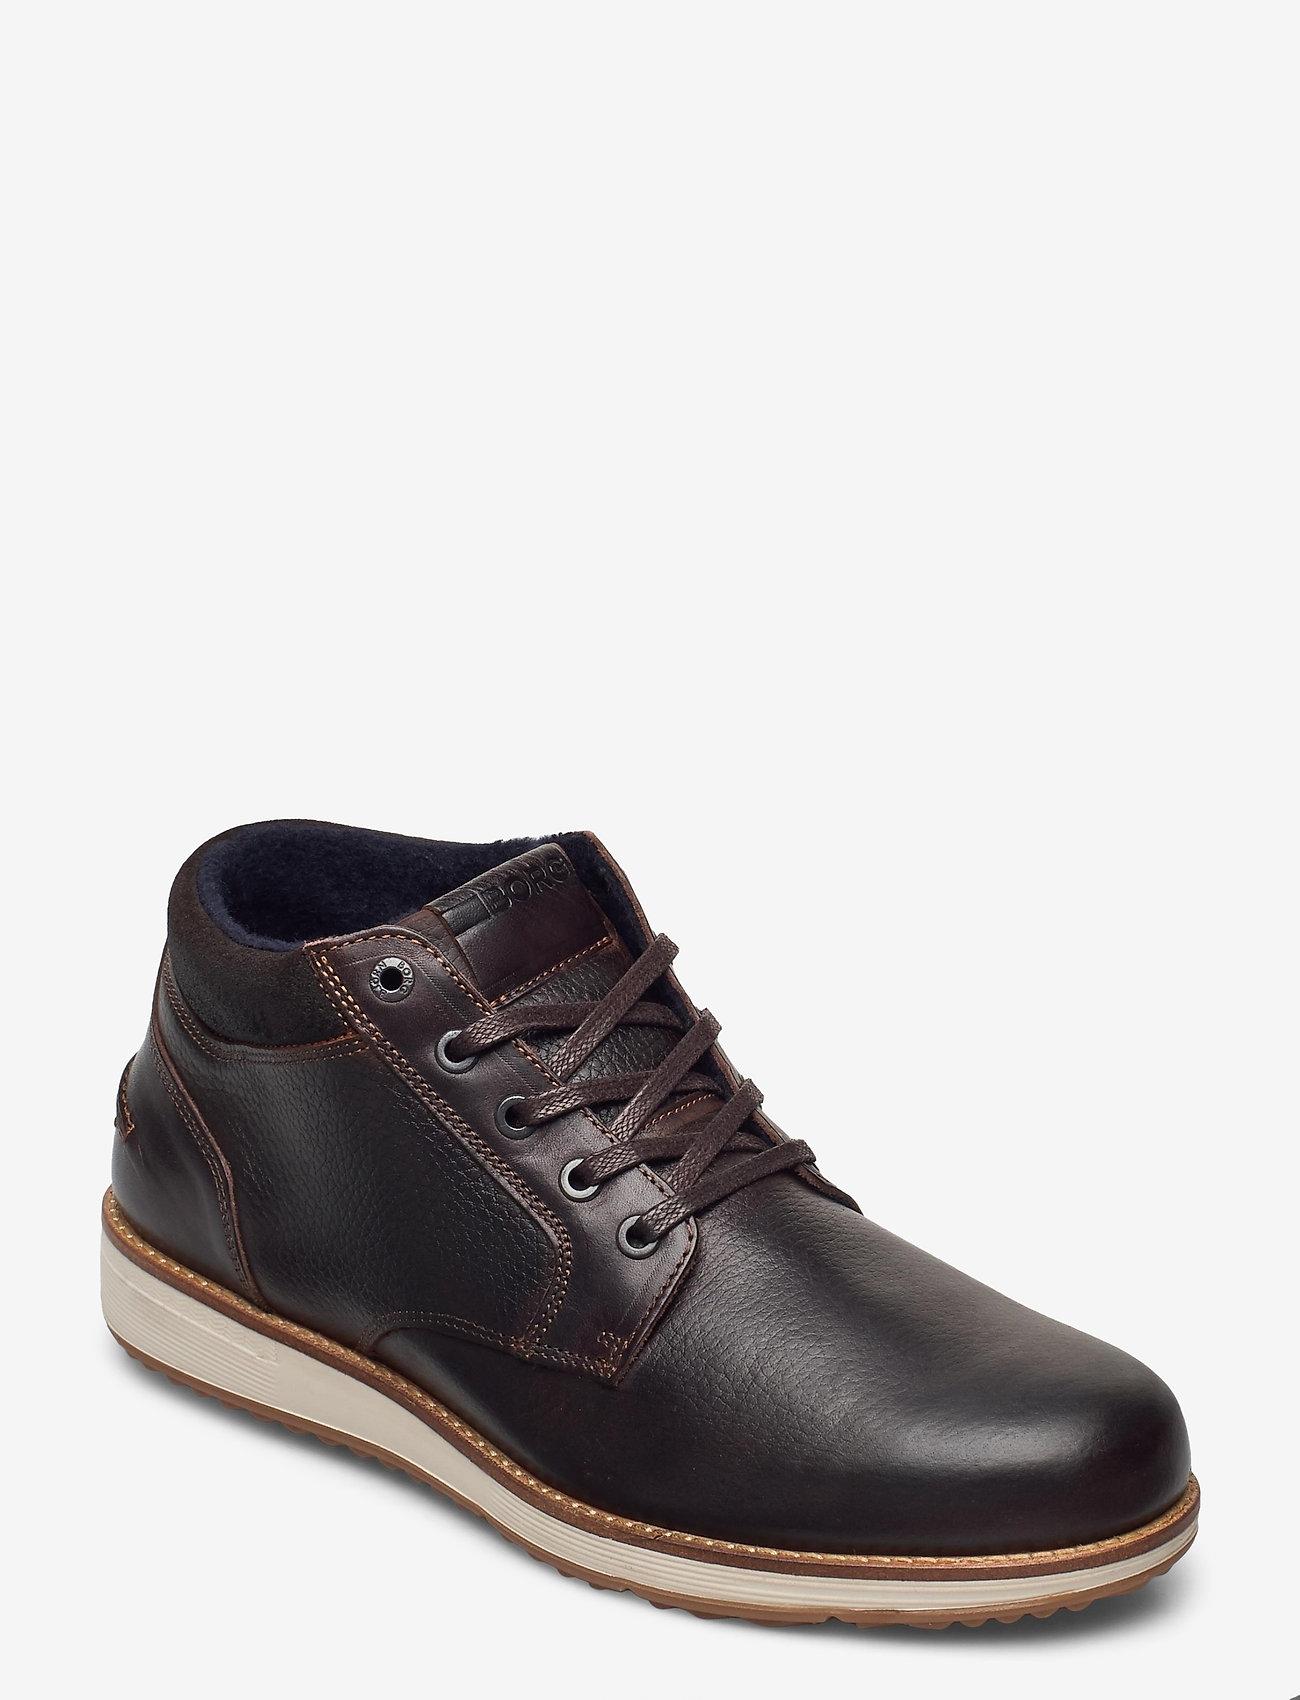 Björn Borg - SUNDAL MID TMB M - laced boots - dark brown - 0